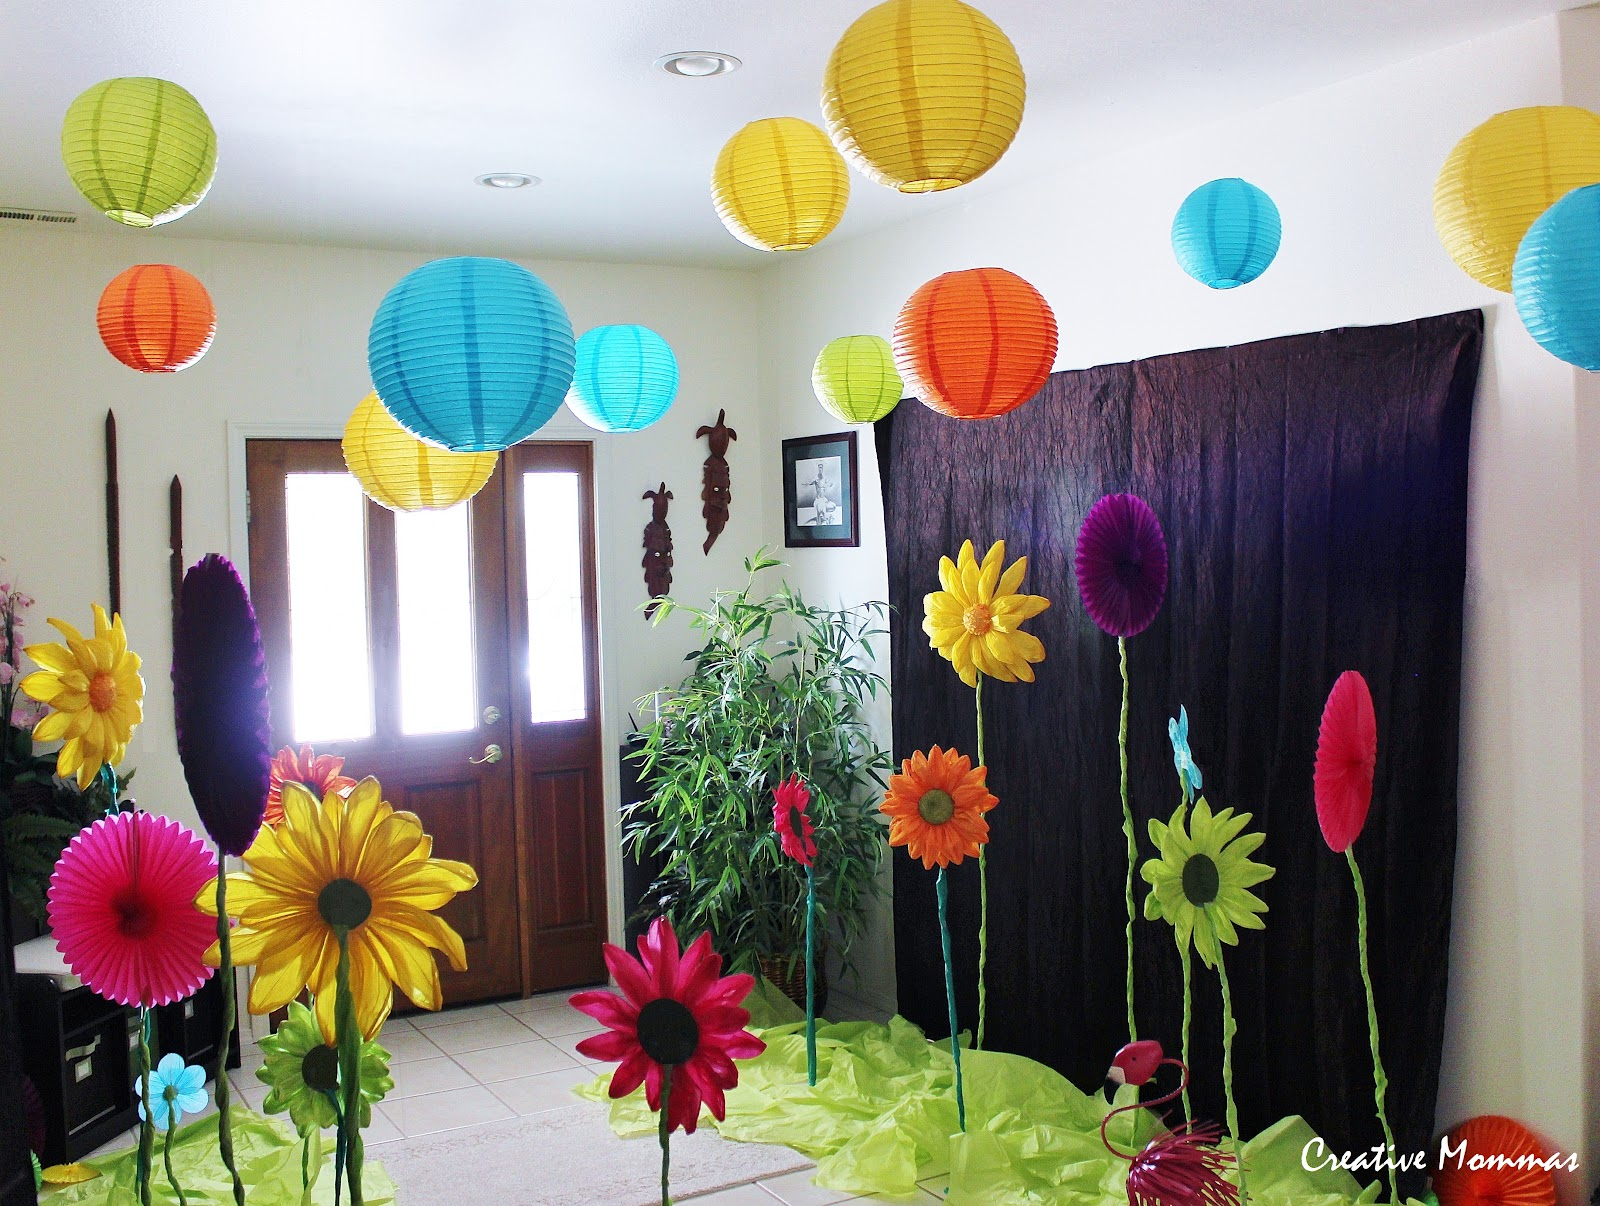 Creative mommas alice in wonderland birthday party - Alice in wonderland decorations ...